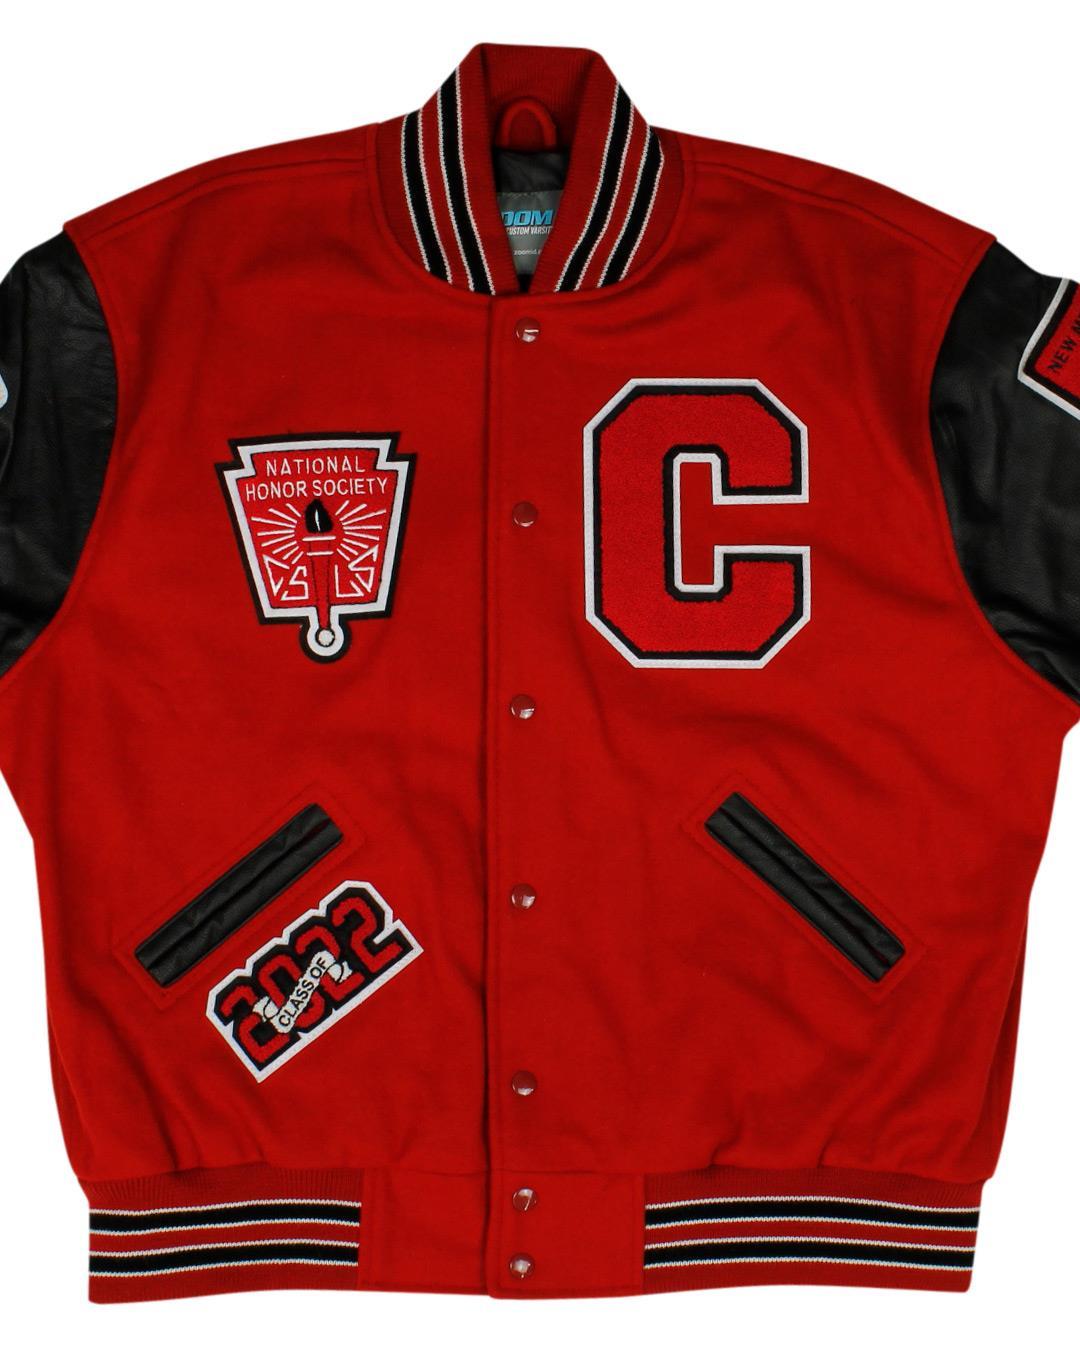 Cobre High School Varsity Jacket, Bayard NM - Front